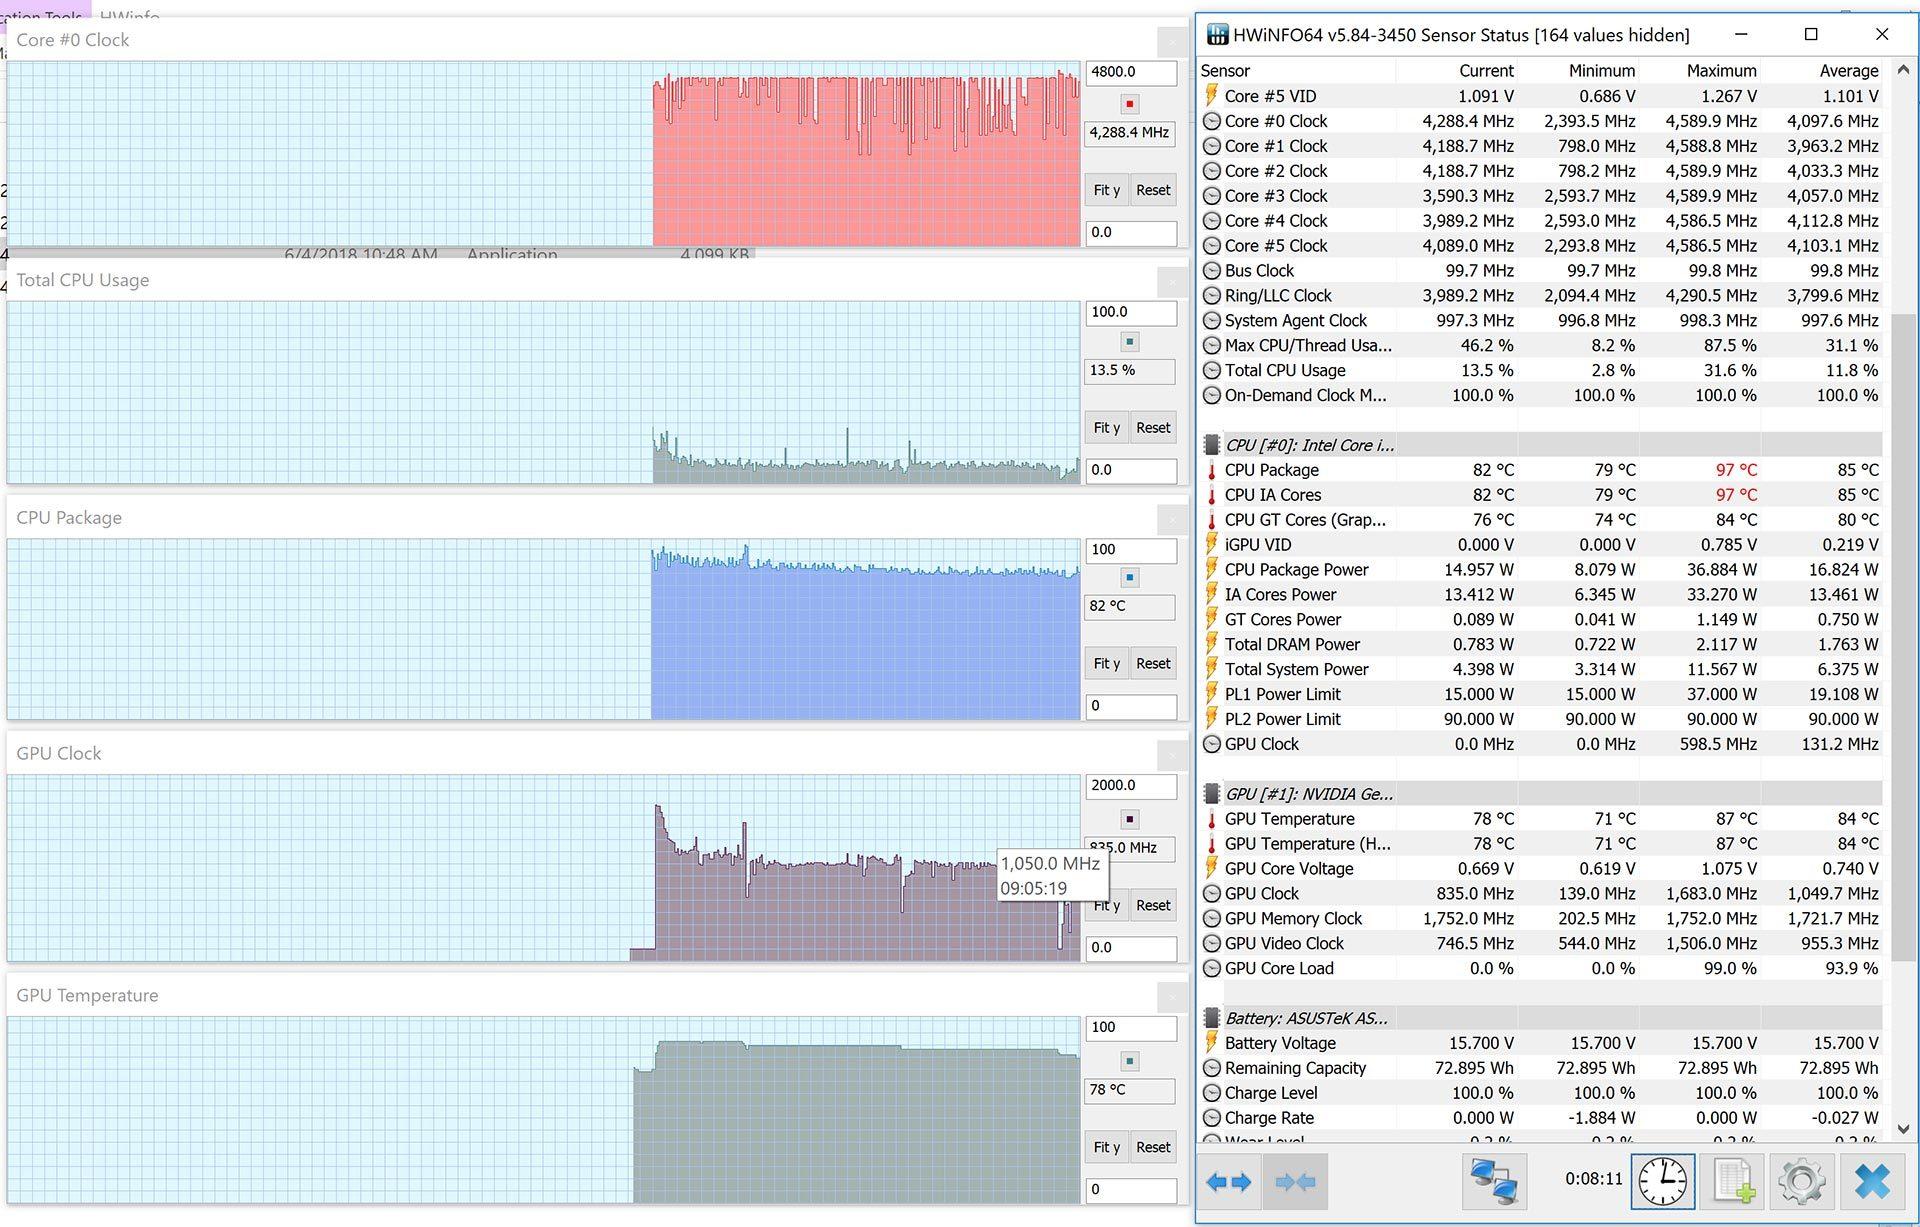 Asus Zenbook Pro 15 UX580GE review (i9-8950HK, GTX 1050 Ti)